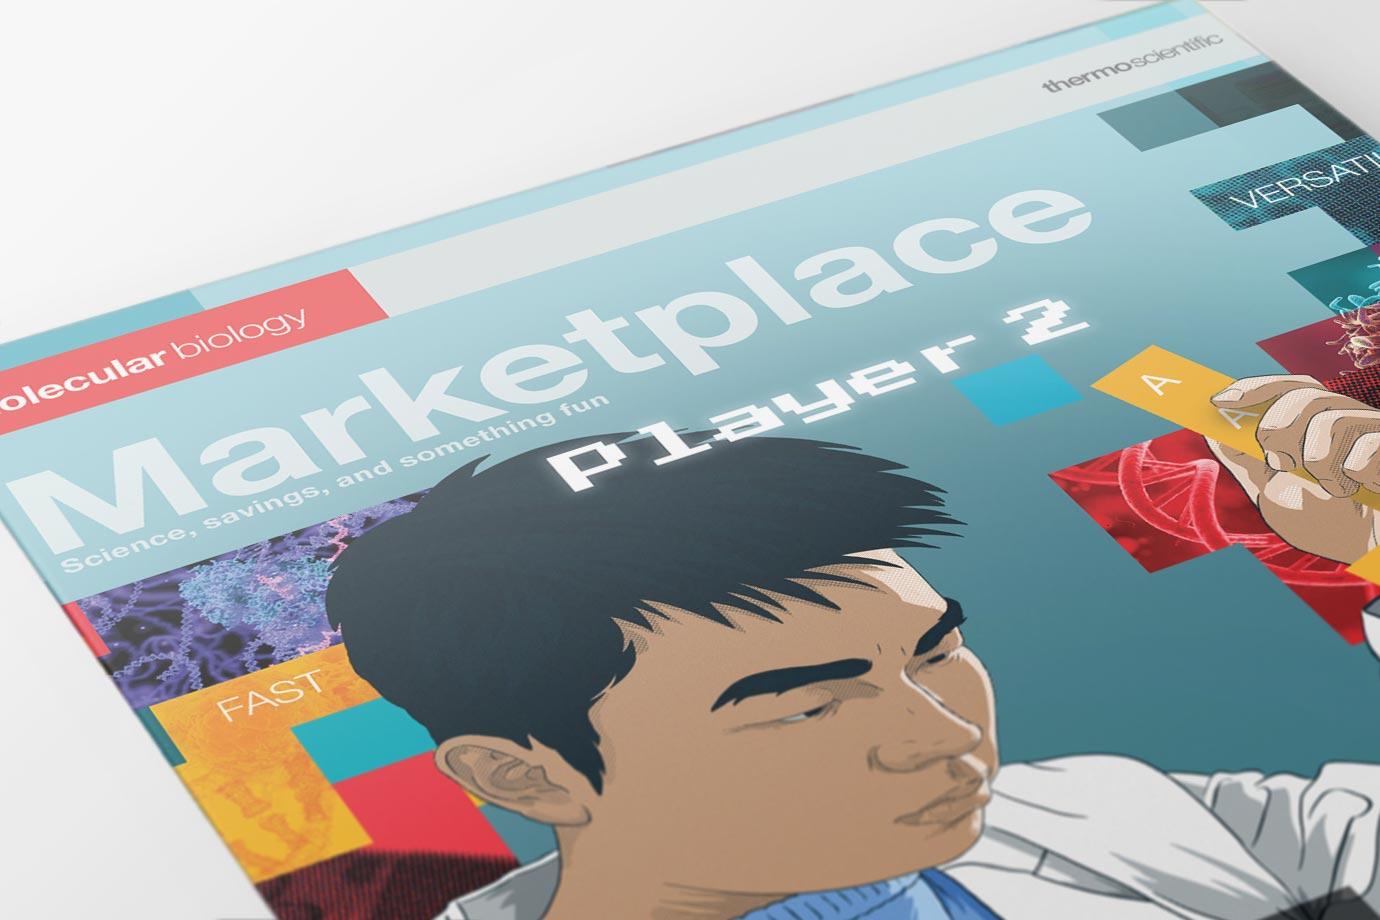 BON_TFS_marketplace_2_cover_perspective_closeup.jpg